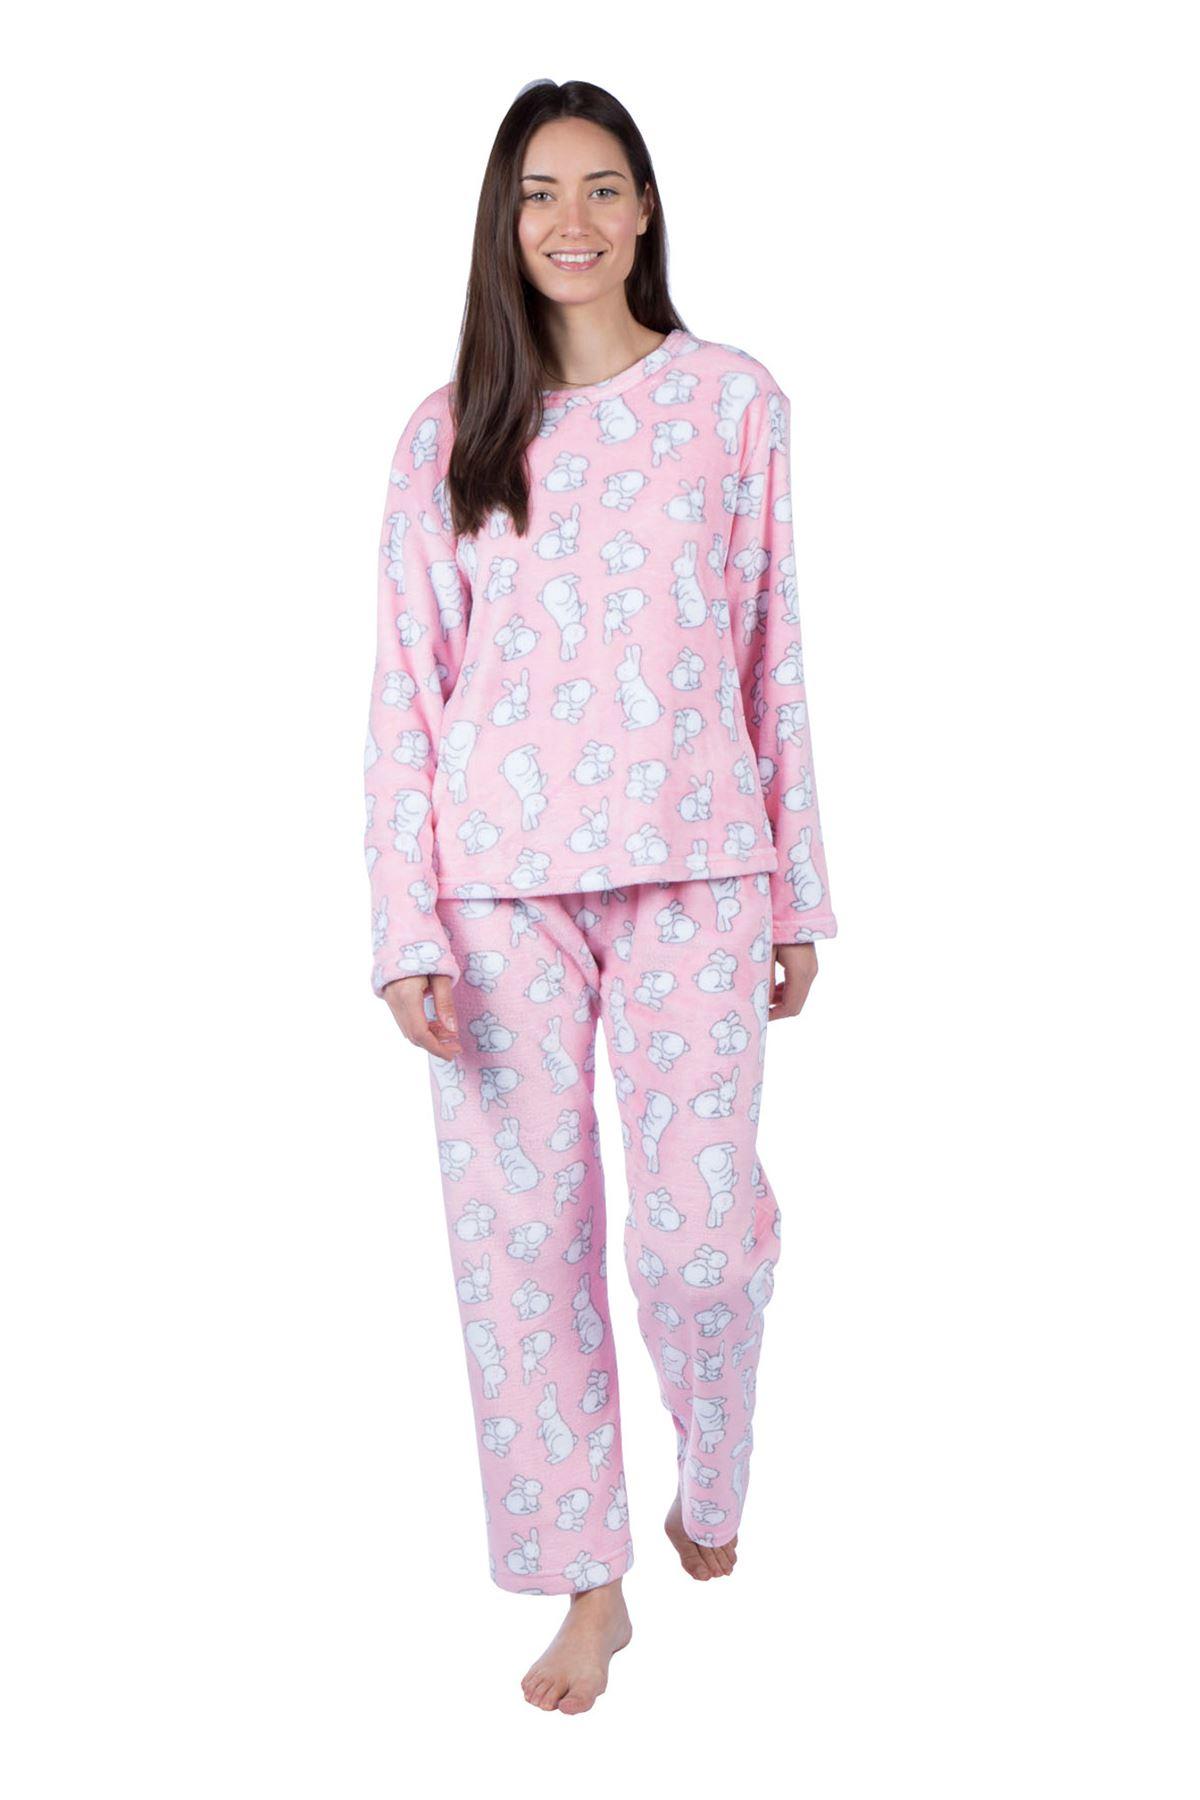 e1eaa498ae Item Description. Ladies Flannel Fleece Pyjama Set Long Sleeve Ruby Rabit  Crewneck Warm Loungewear ...